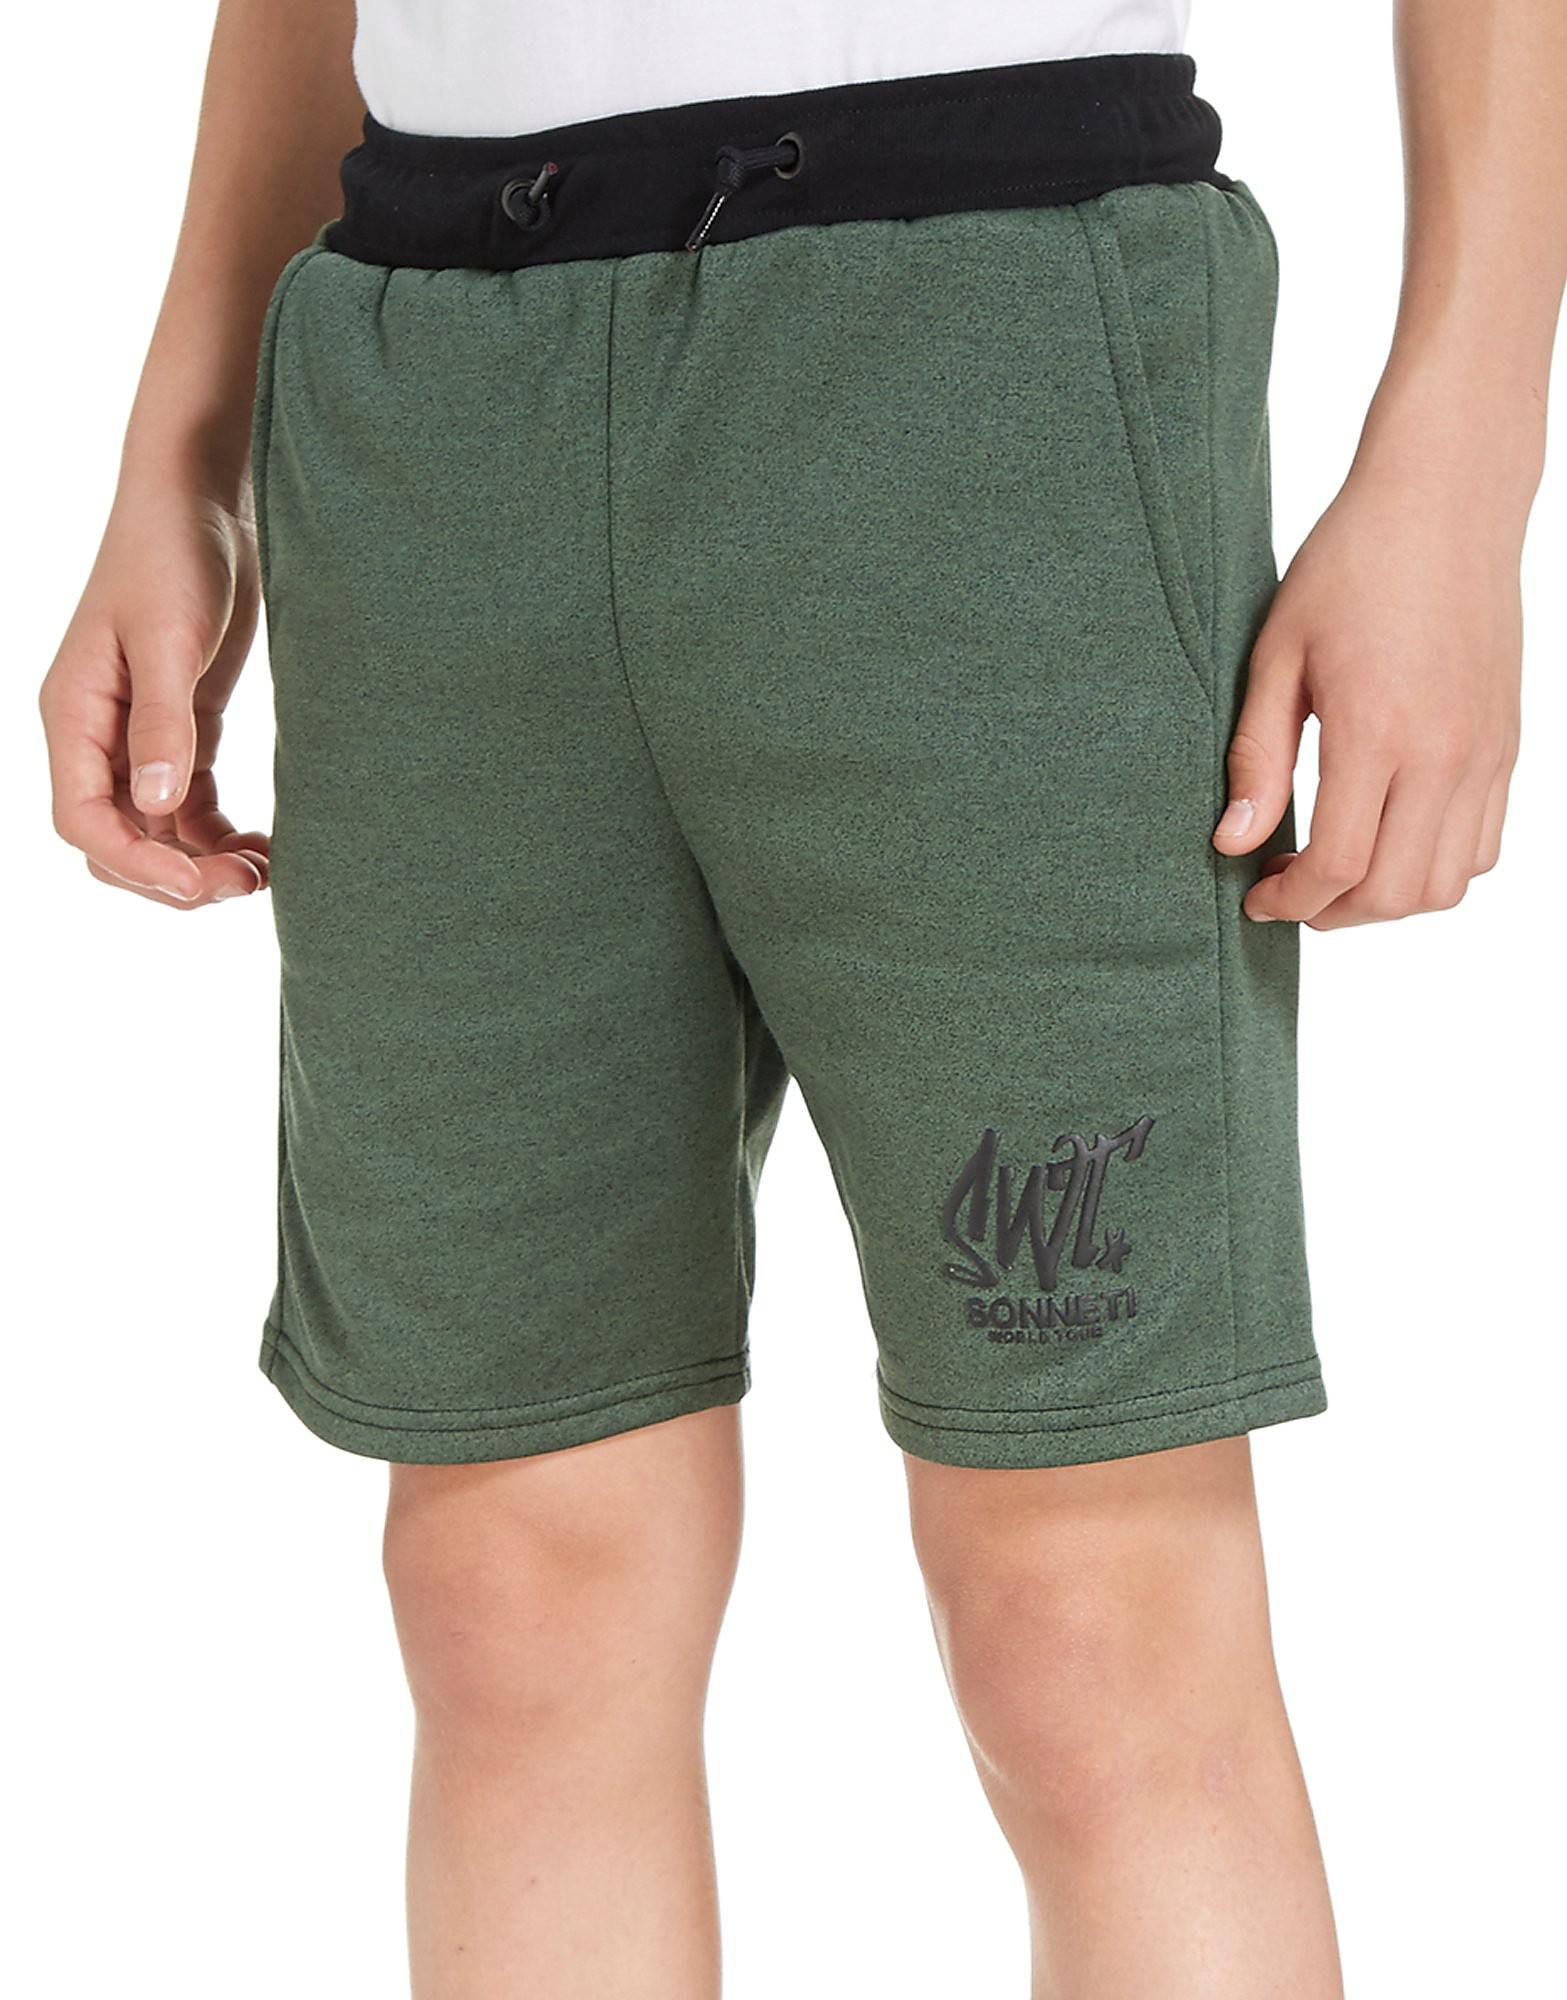 Sonneti Compounder Shorts Junior